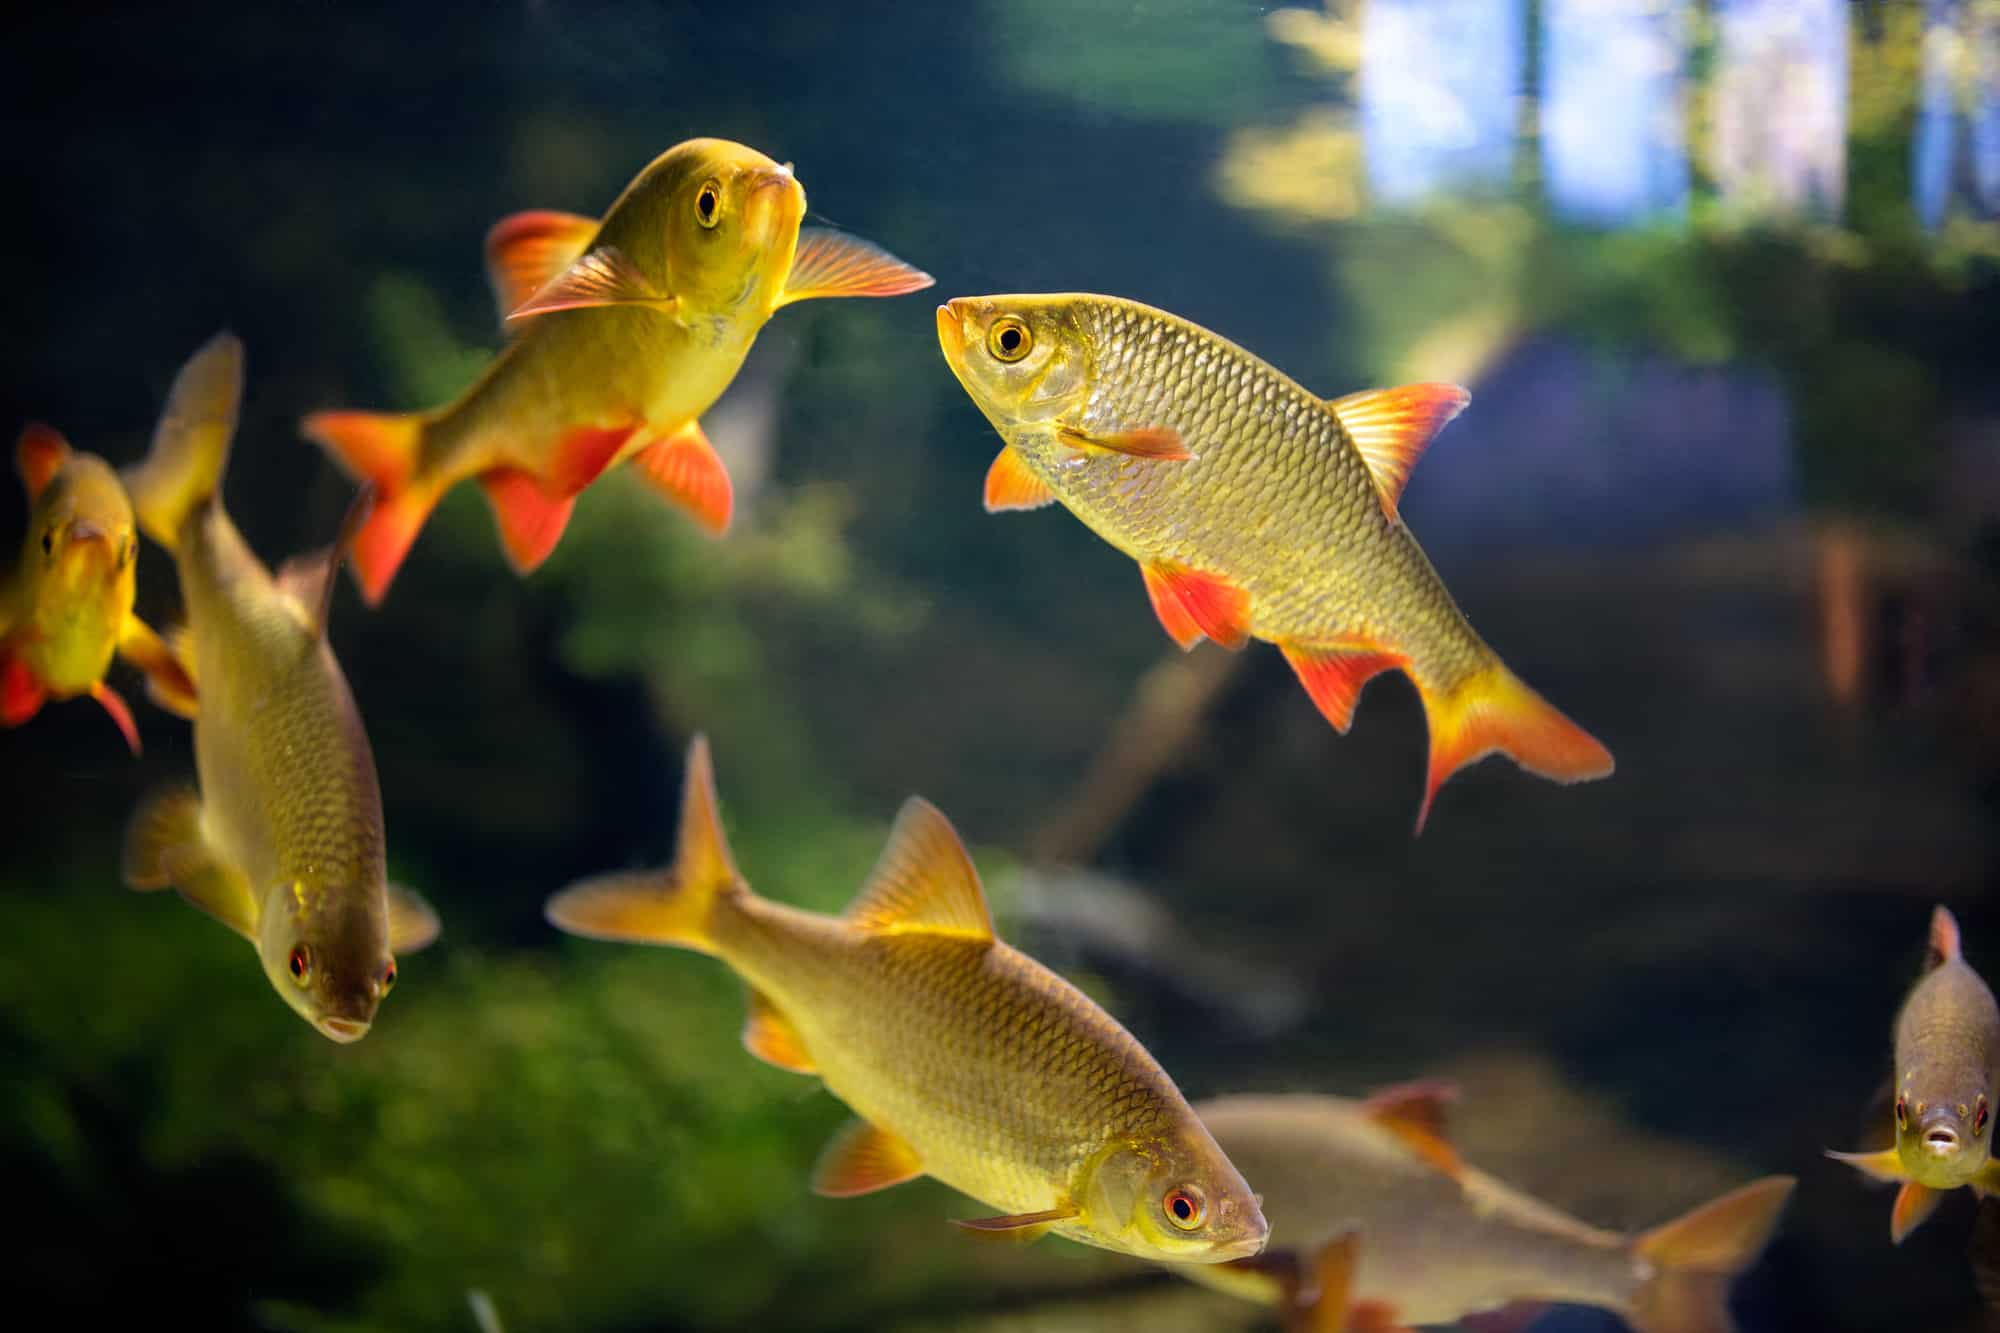 Bloodfin tetra fishes swimming inside tropical aquarium.